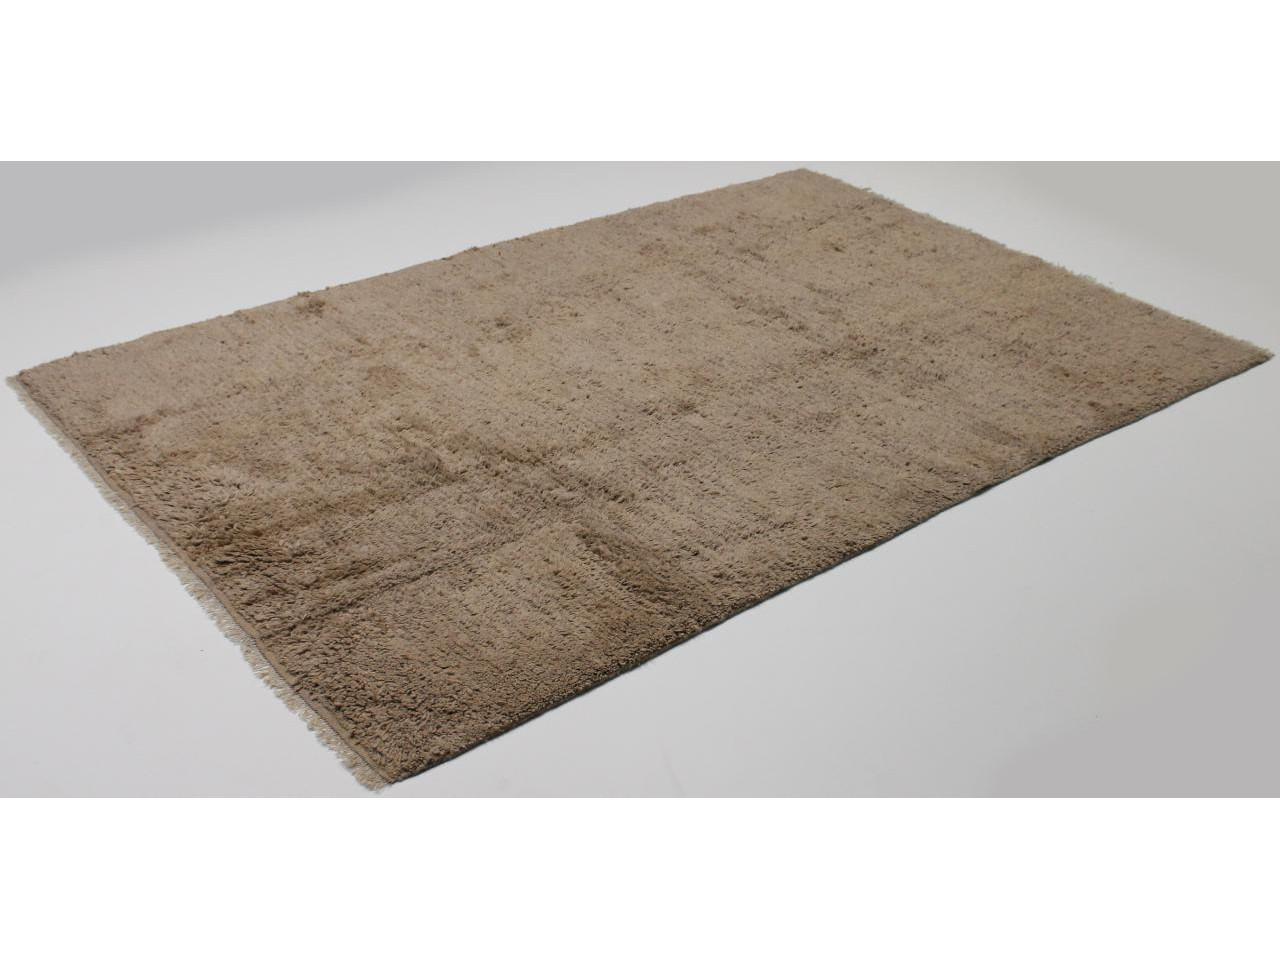 berb re tapis berb res n 25736 291x200cm. Black Bedroom Furniture Sets. Home Design Ideas